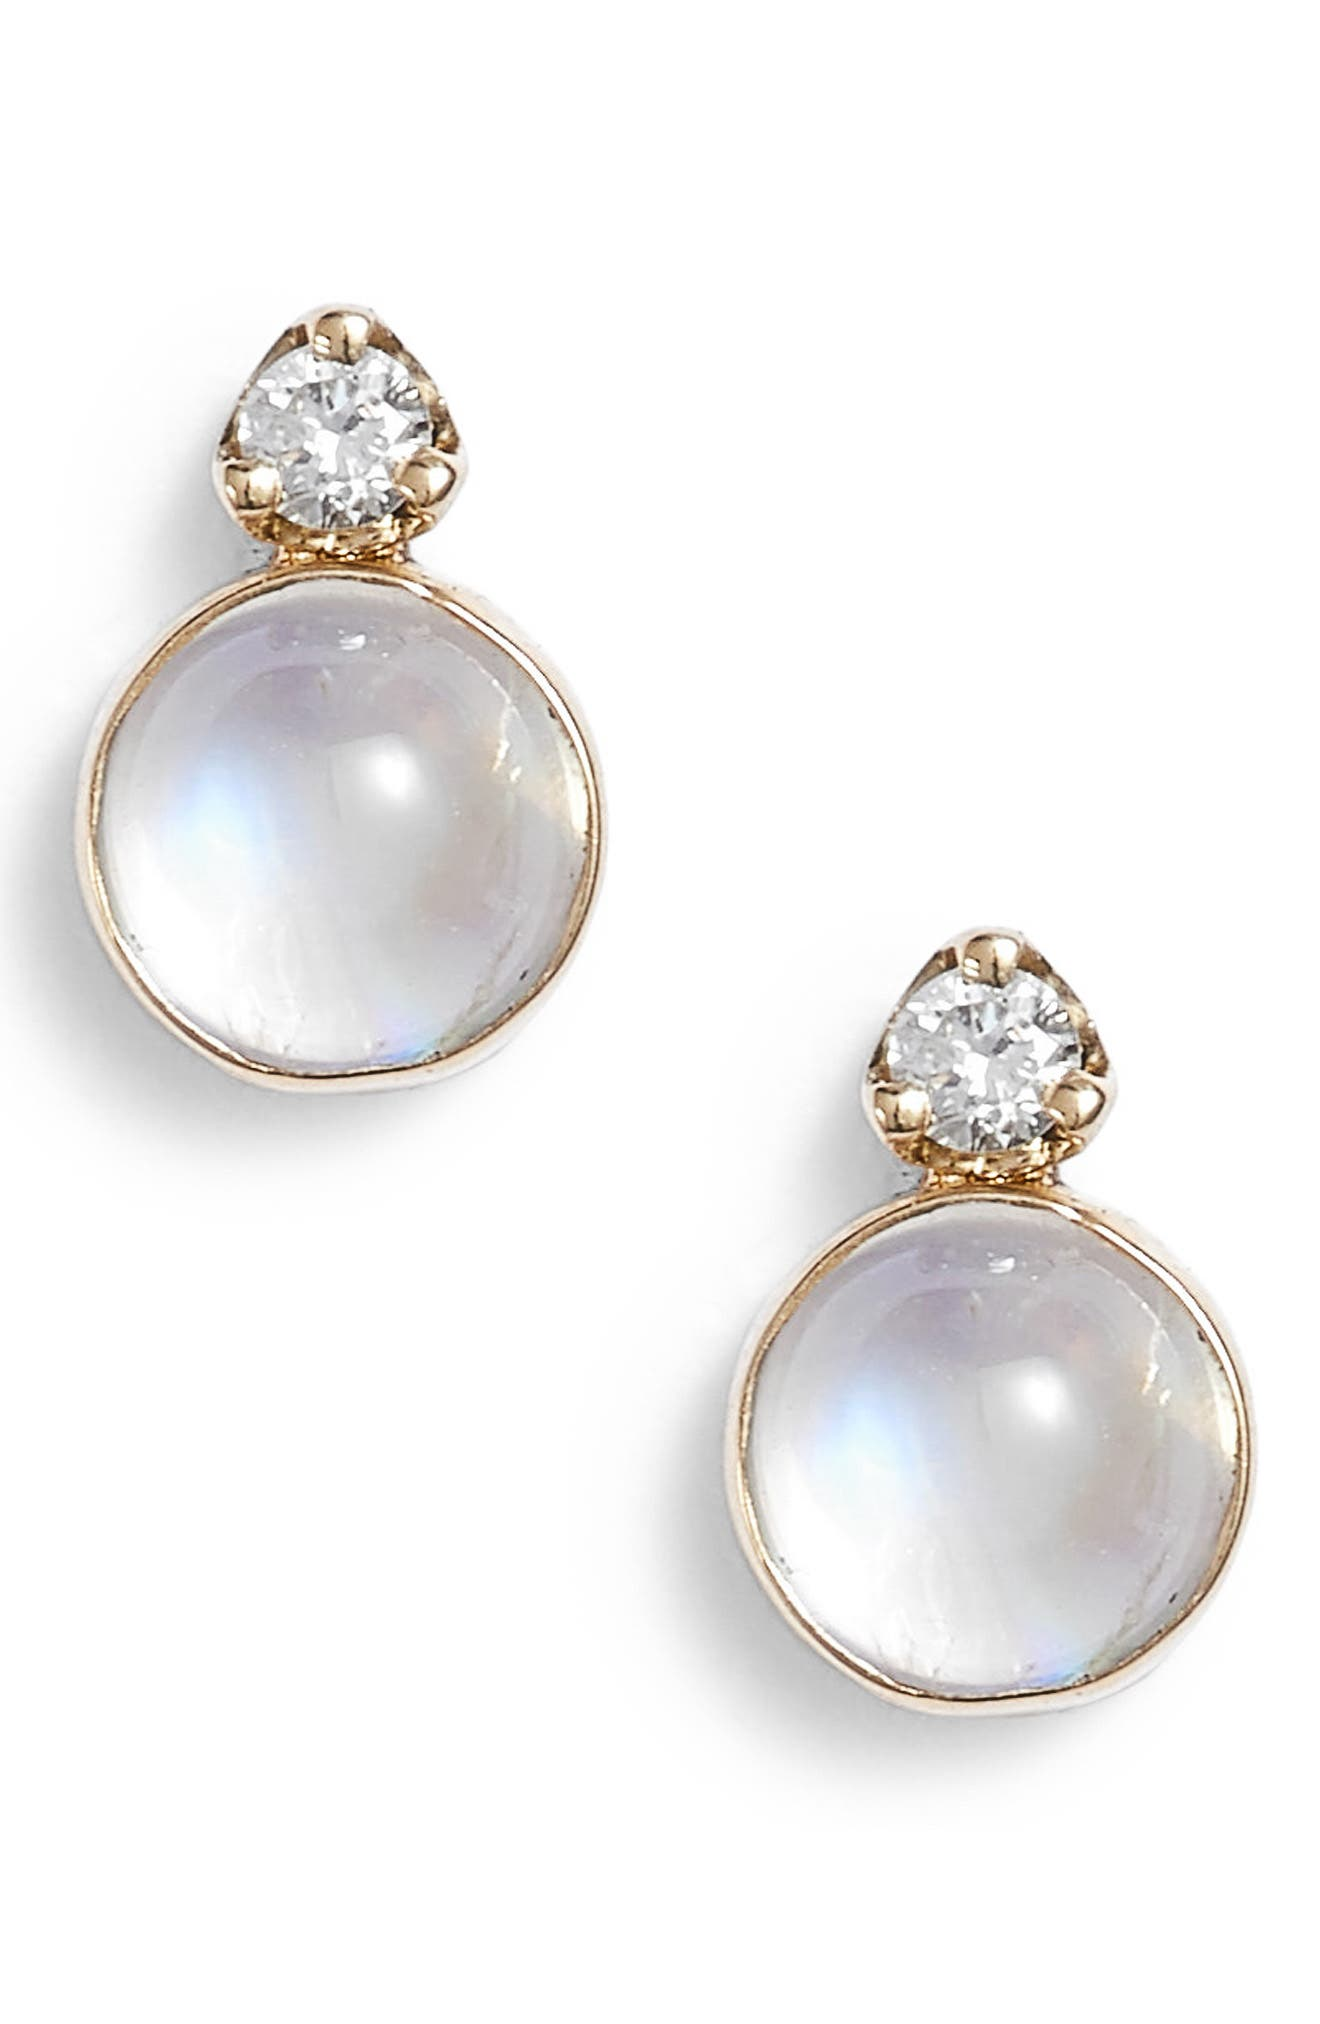 Zoe Chicco Moonstone & Diamond Stud Earrings